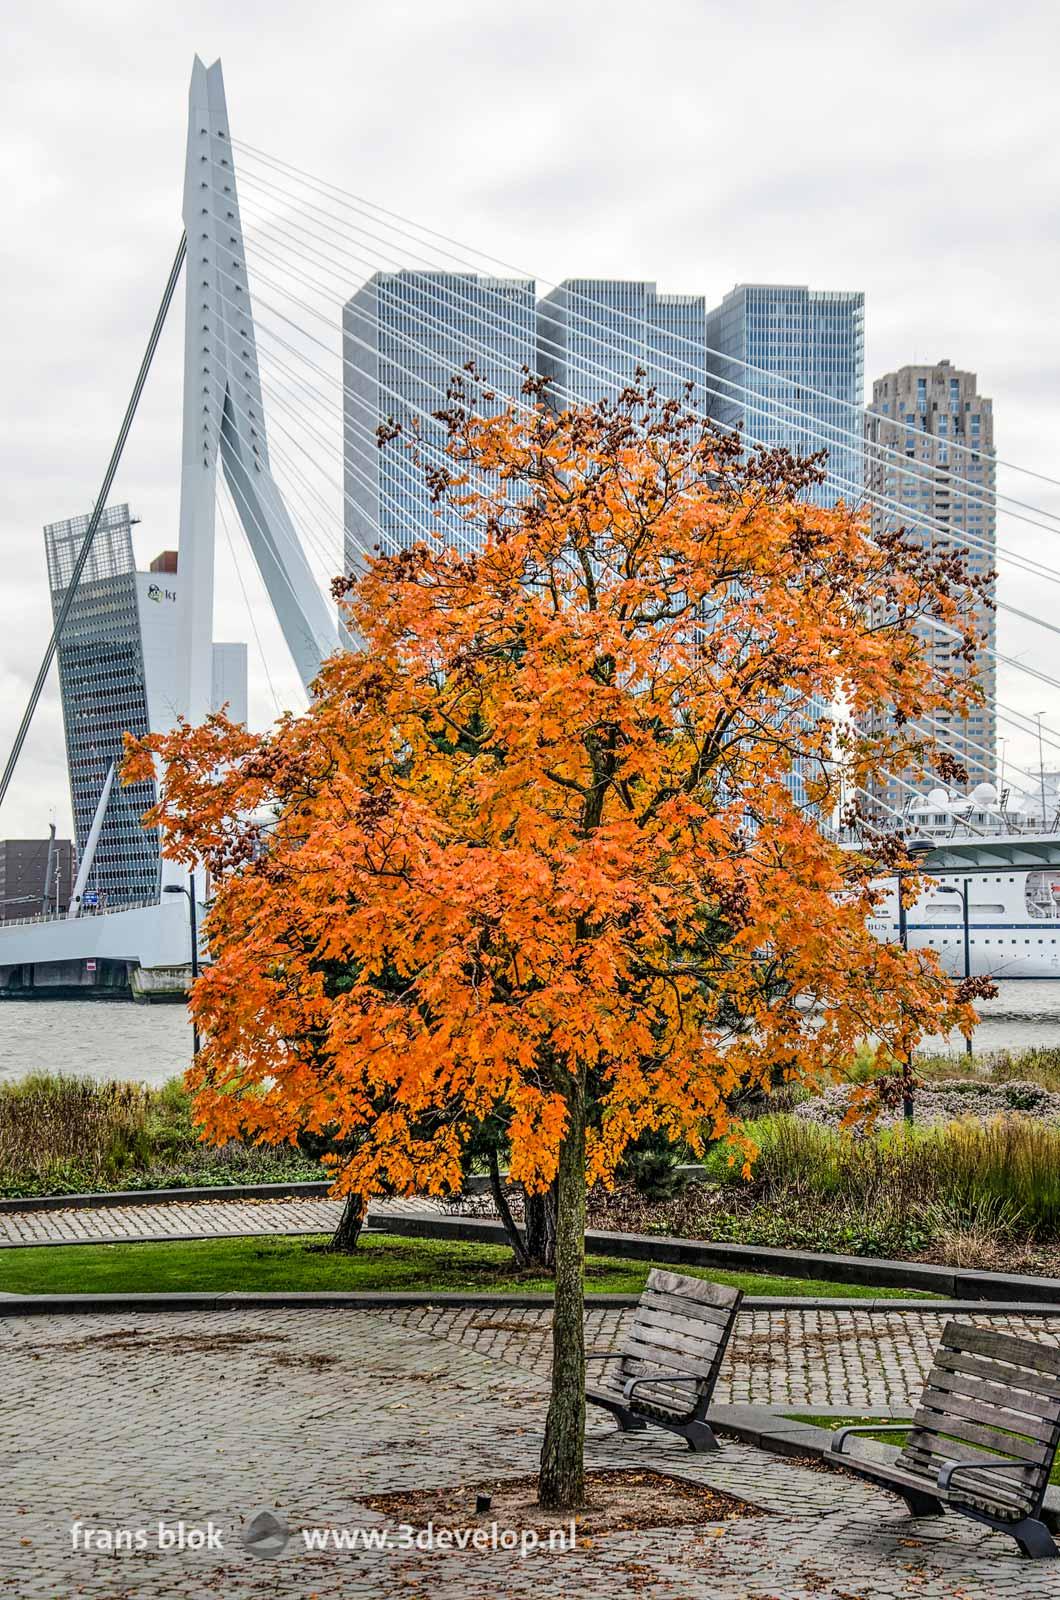 Varnish tree (koelreuteria paniculata) in autumn color, in the little park at Leuvehoofd near Erasmus bridge in Rotterdam, The Netherlands